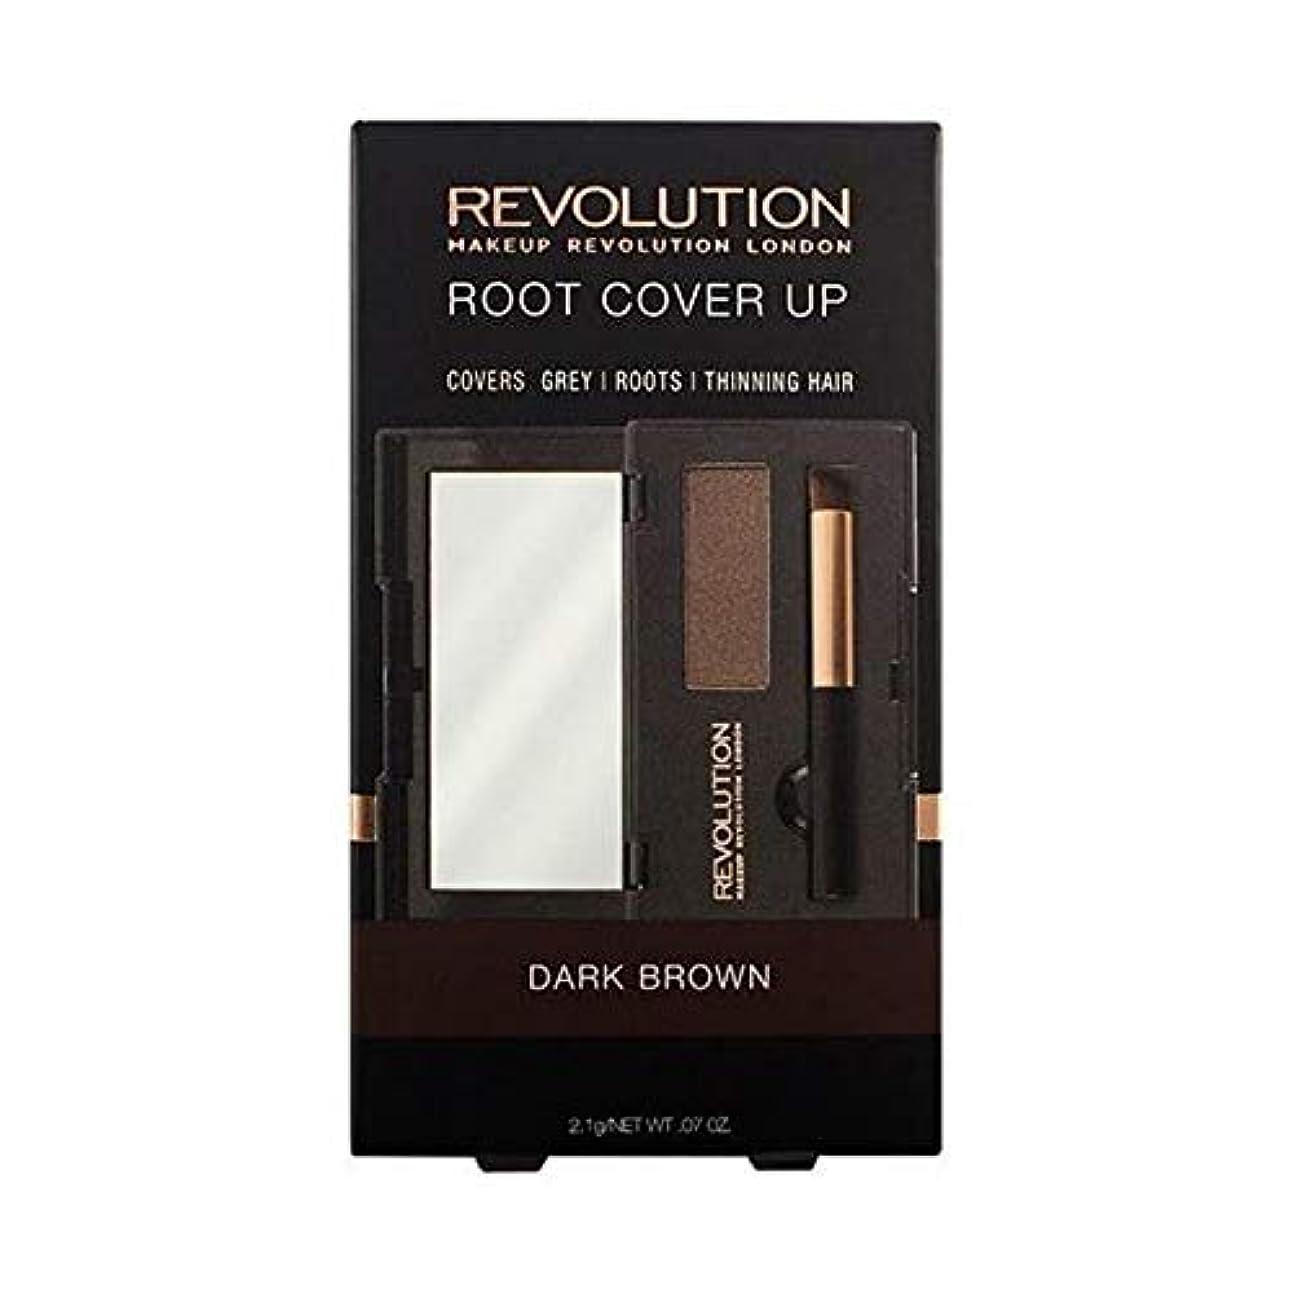 [Hair Revolution ] ヘア革命ルートはダークブラウンをカバー - Hair Revolution Root Cover Up Dark Brown [並行輸入品]